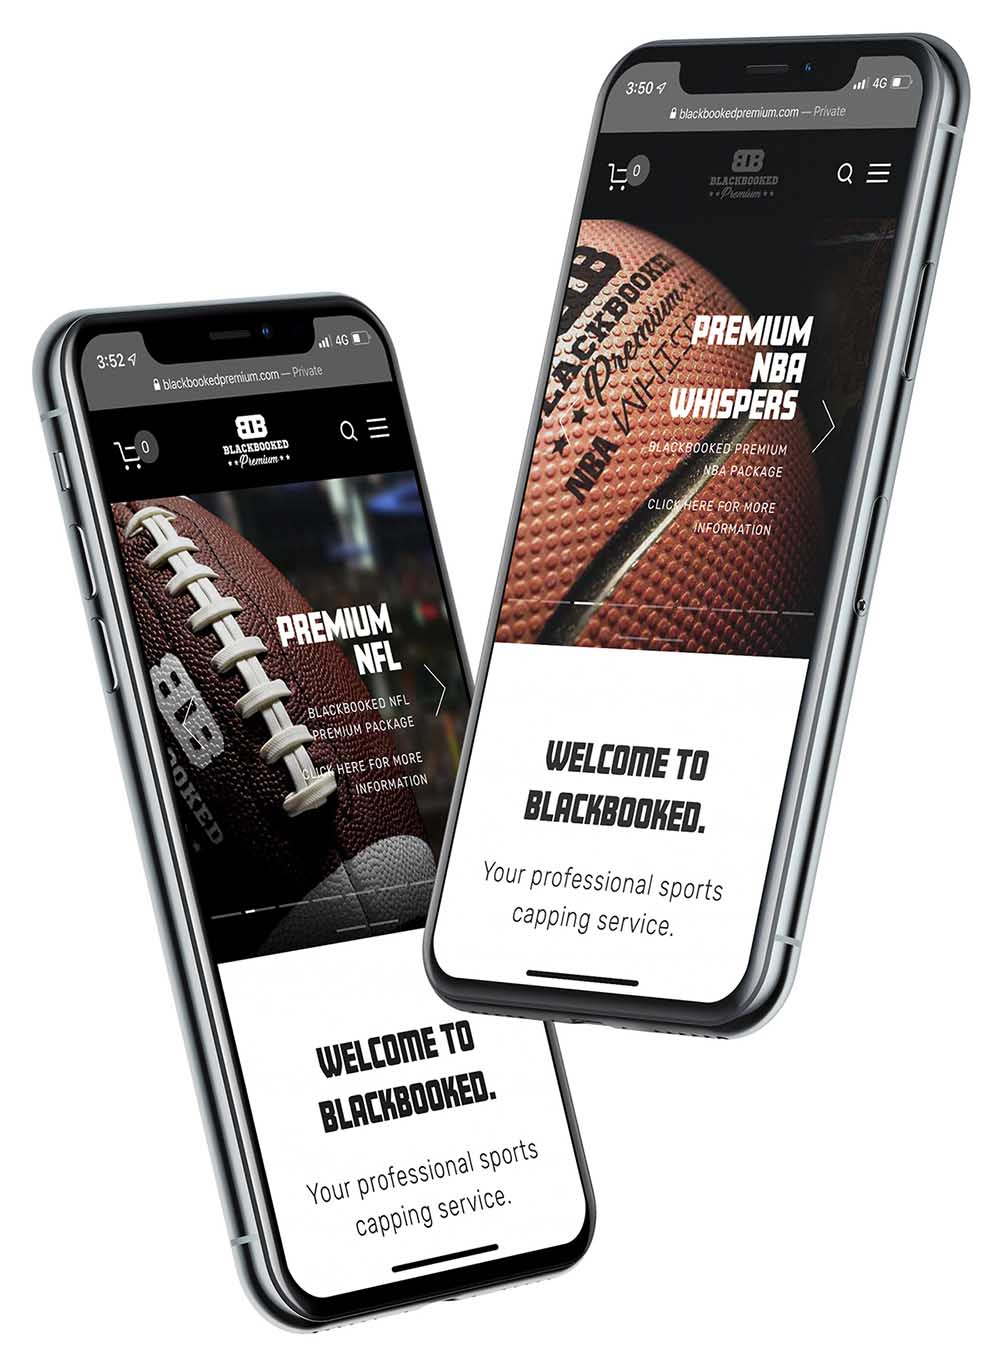 blackbooked premium website image 2 iphones.jpg